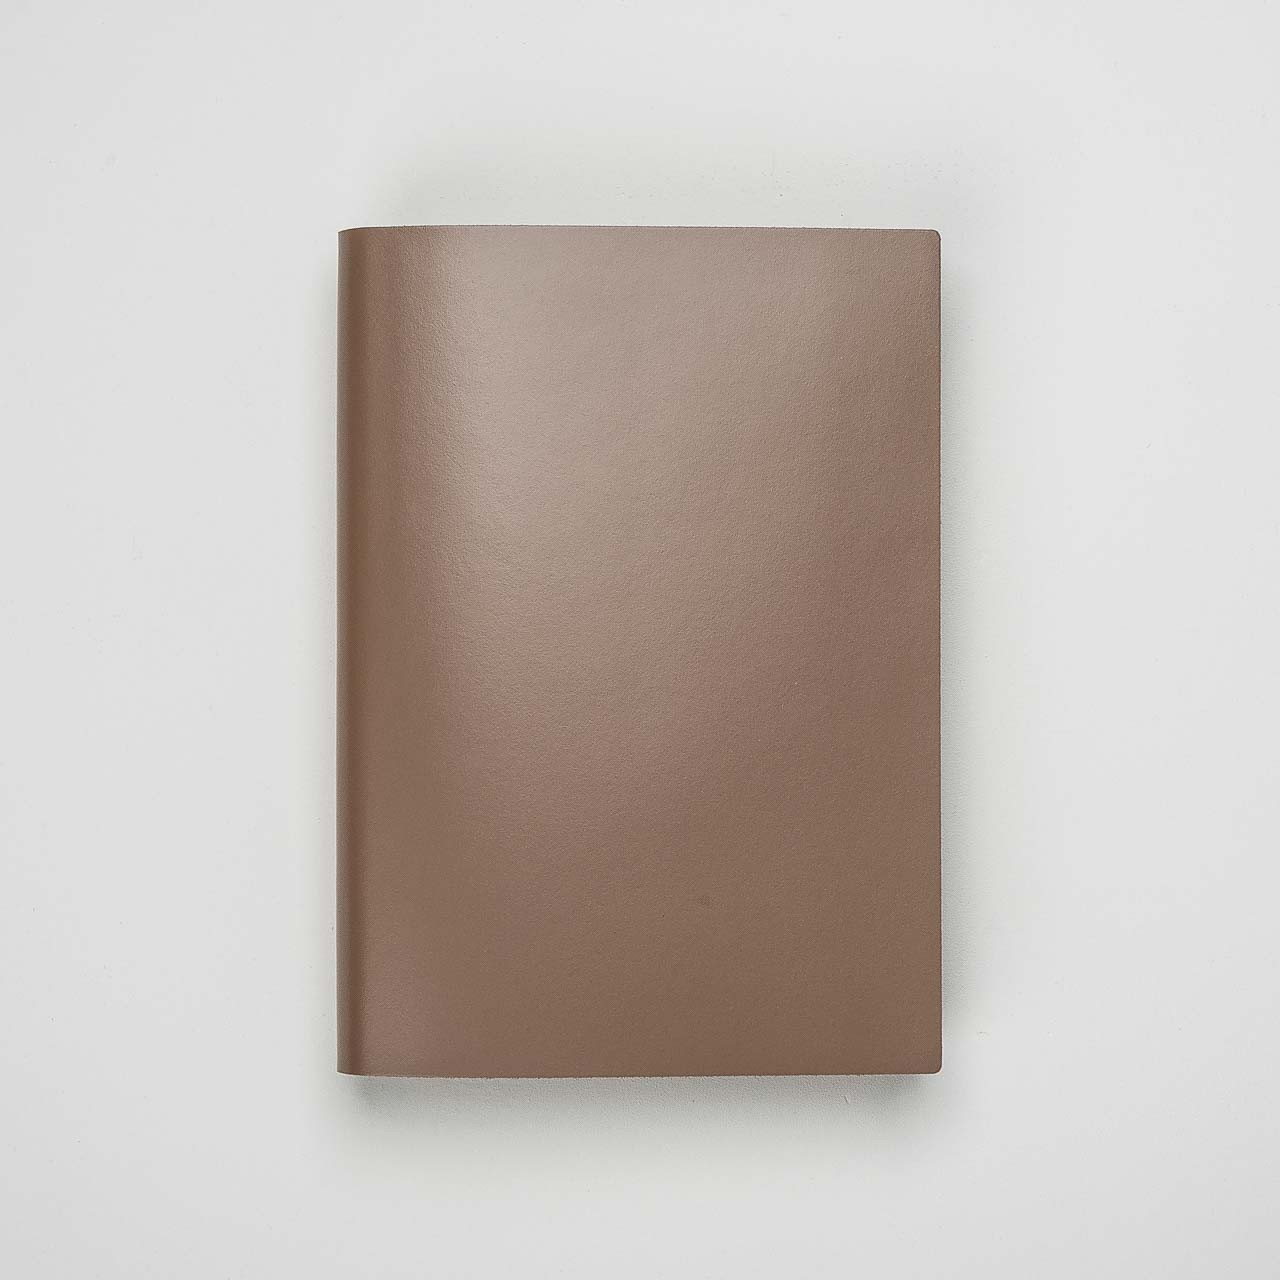 Pinetti Notizbuch Kalbsleder taupe